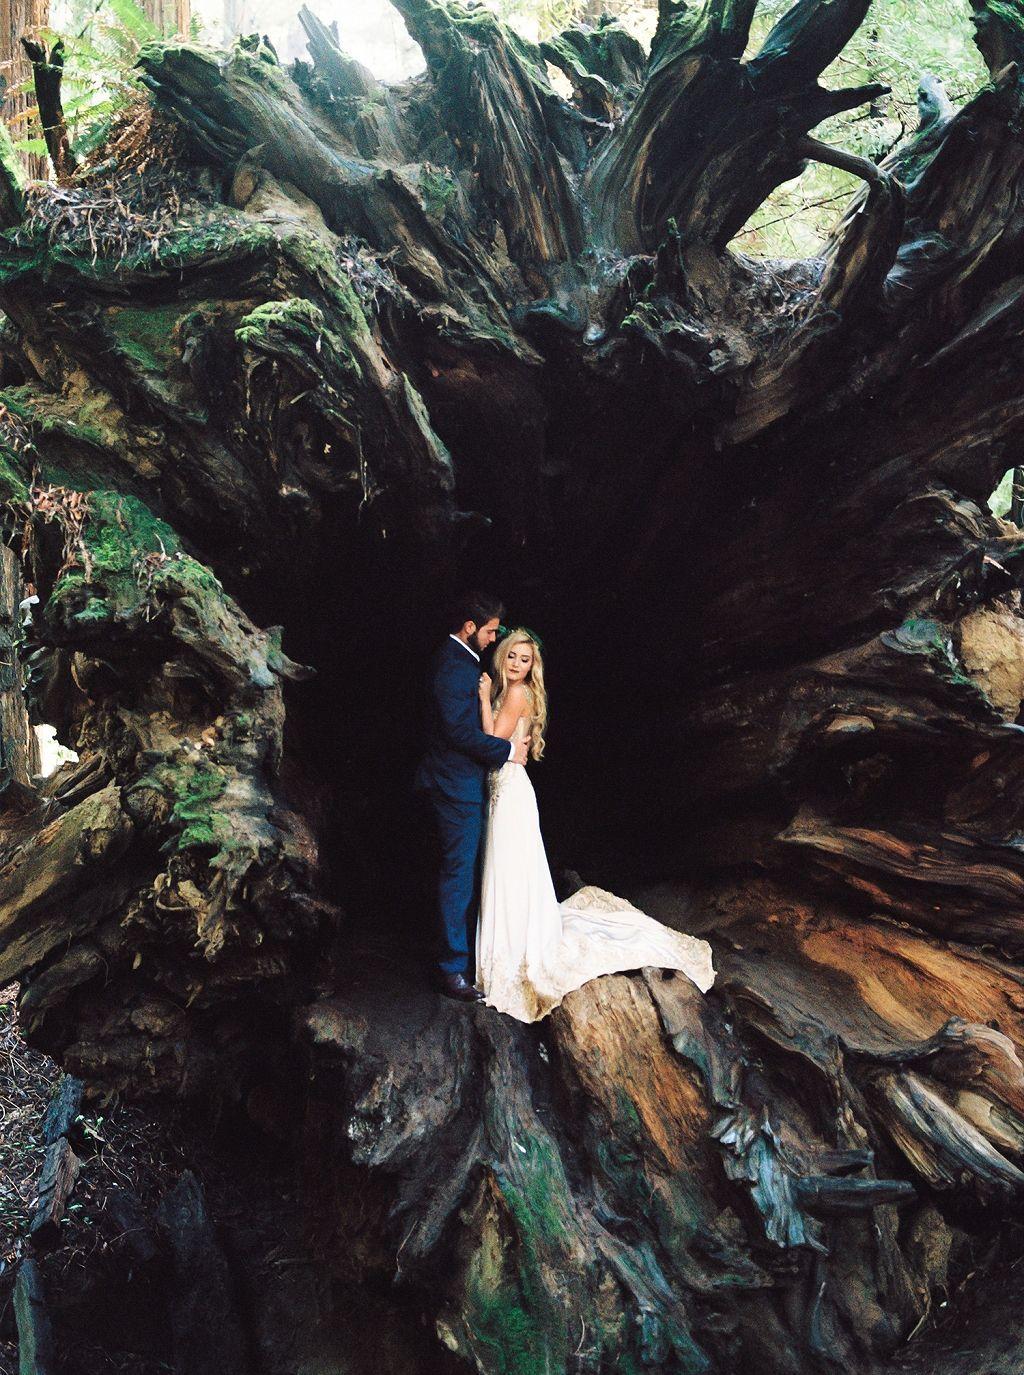 Great 100+ Forest Wedding Ideas https://weddmagz.com/100-forest-wedding-ideas/